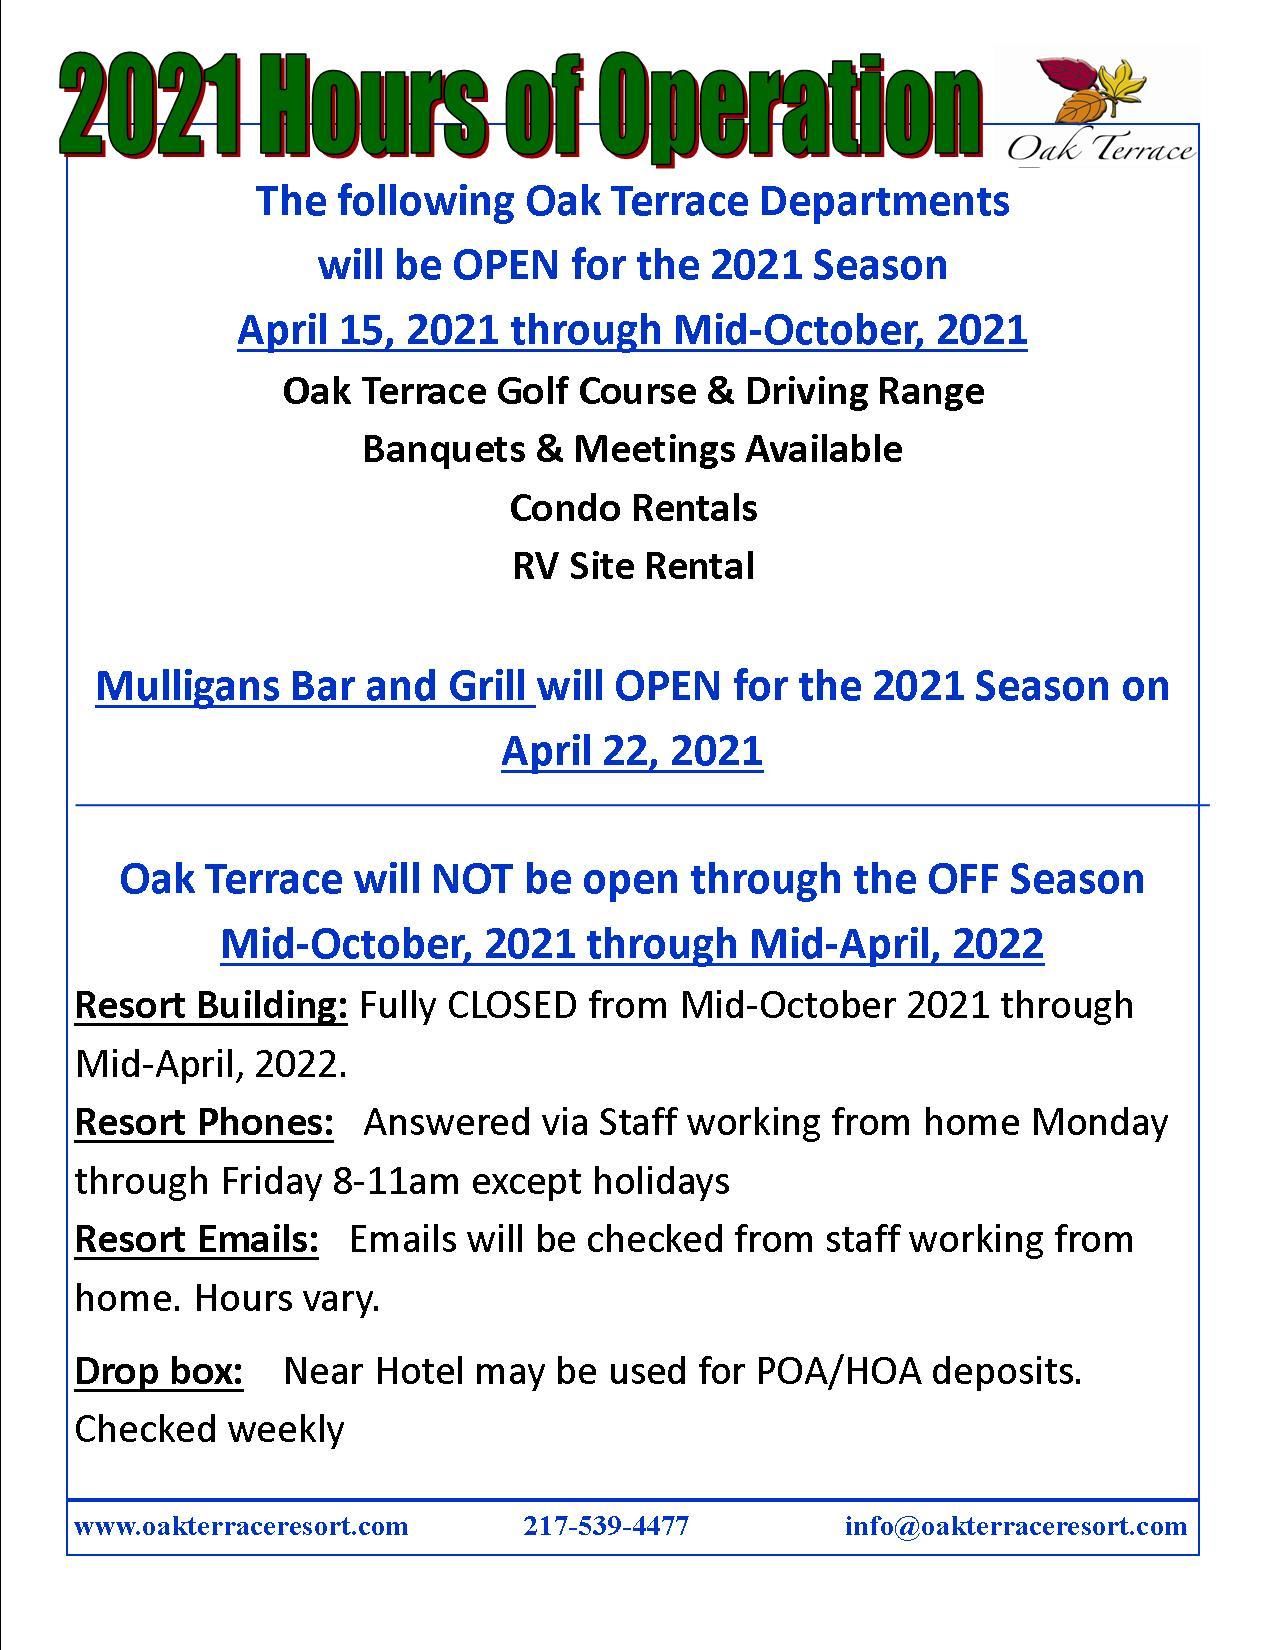 2021 Resort Hours of Operation3